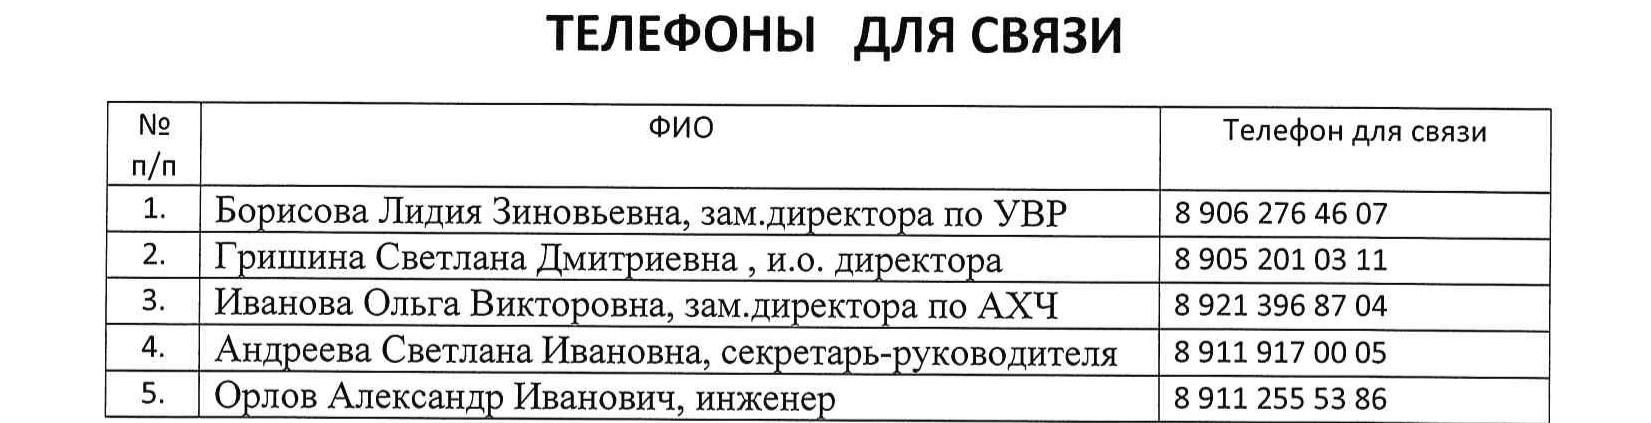 Телефоны для связи дмш (1)-1 (2)